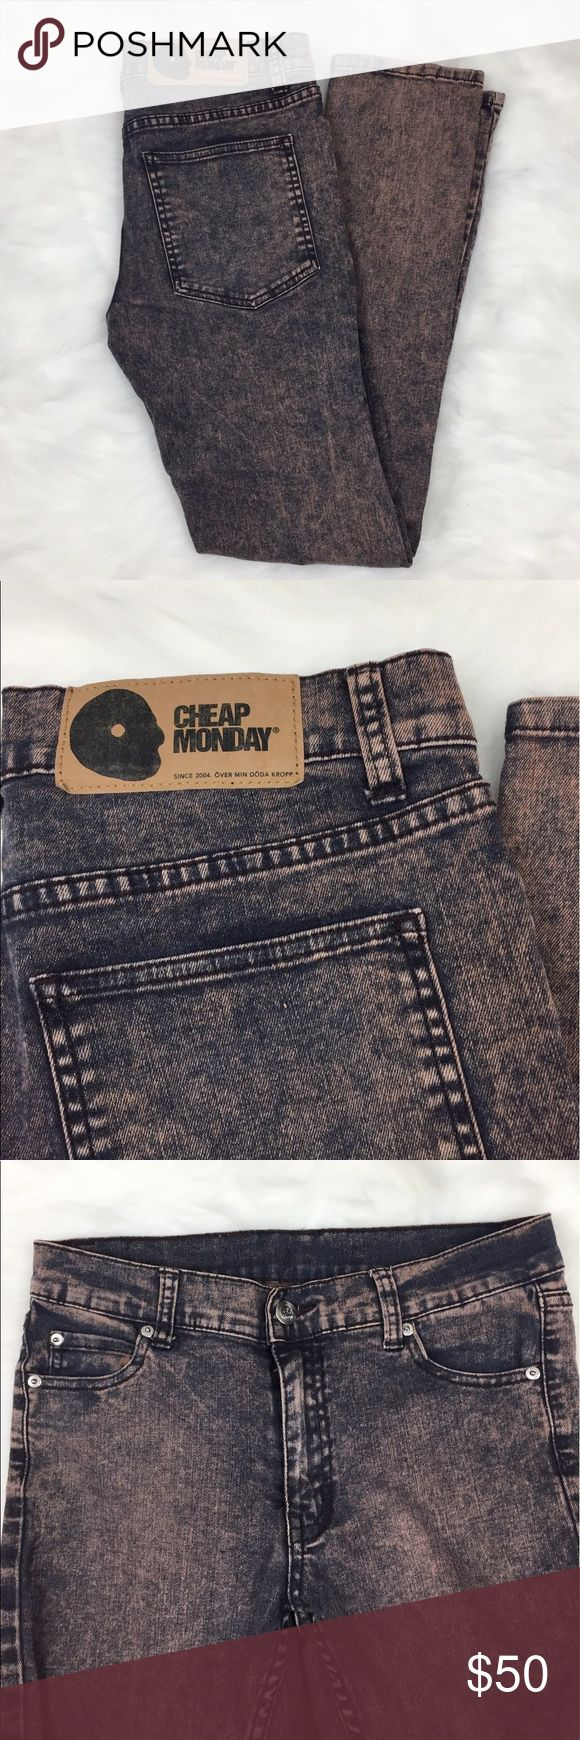 "Cheap Monday pink Acid Wash Skinny Jeans Gently used Cheap Monday Pink acid wash skinny jeans. Size 29/30. Inseam: 29.5"", rise: 8.5"", hips: 17"" flat across, waist: 14.5"" flat across Cheap Monday Jeans Skinny"